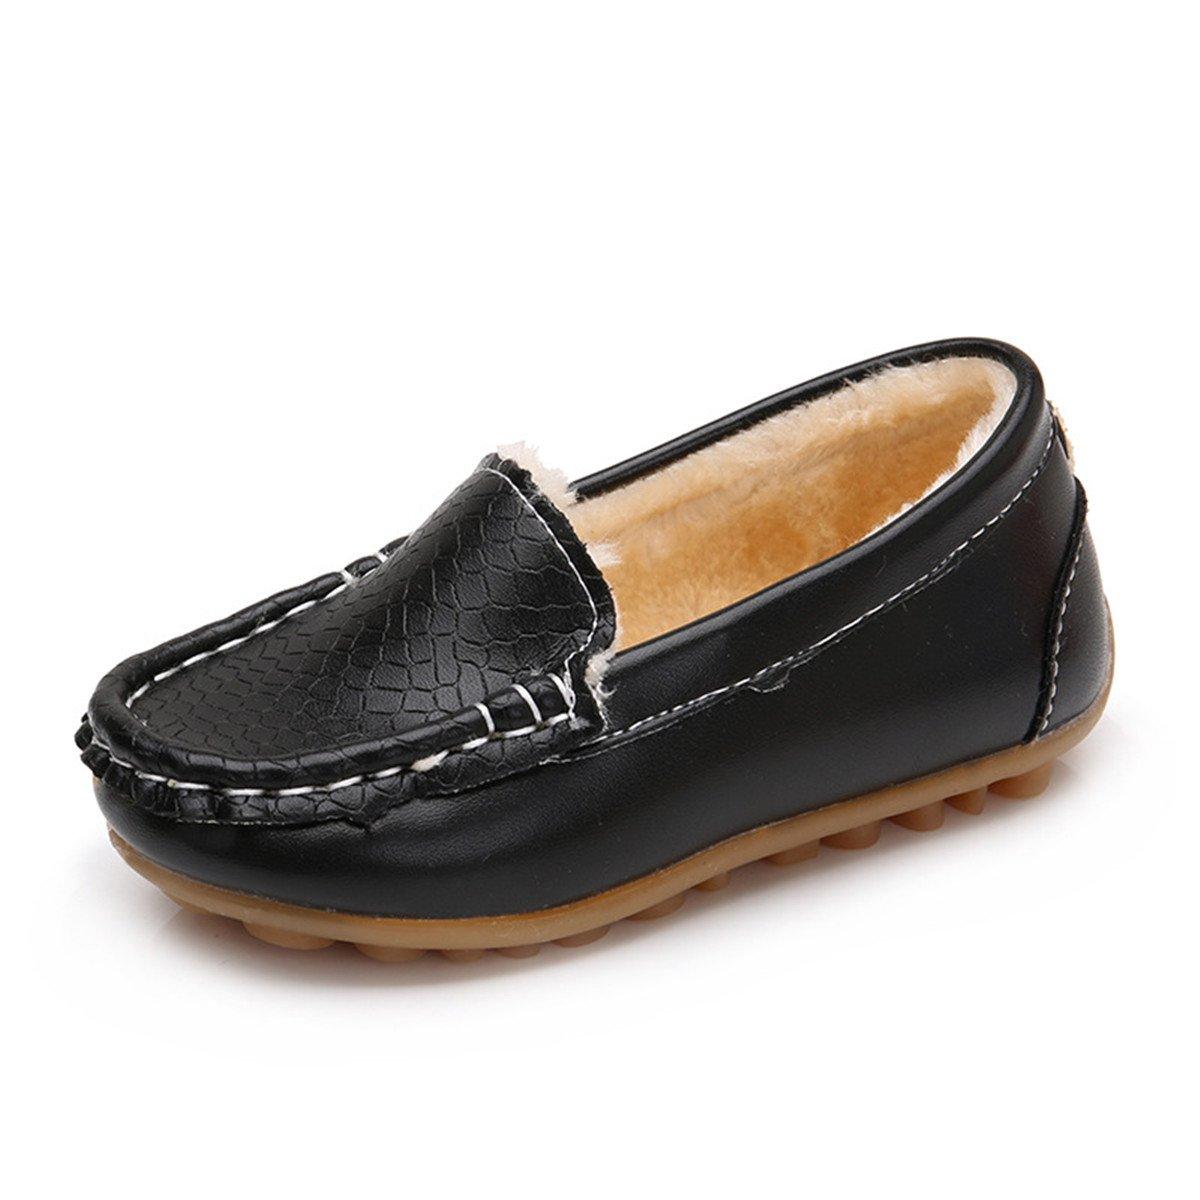 BENHERO Kids Boys Girls Loafers Slip on Soft Synthetic Leather Boat Dress Shoes Flat(9.5 M US Toddler,B-Black)